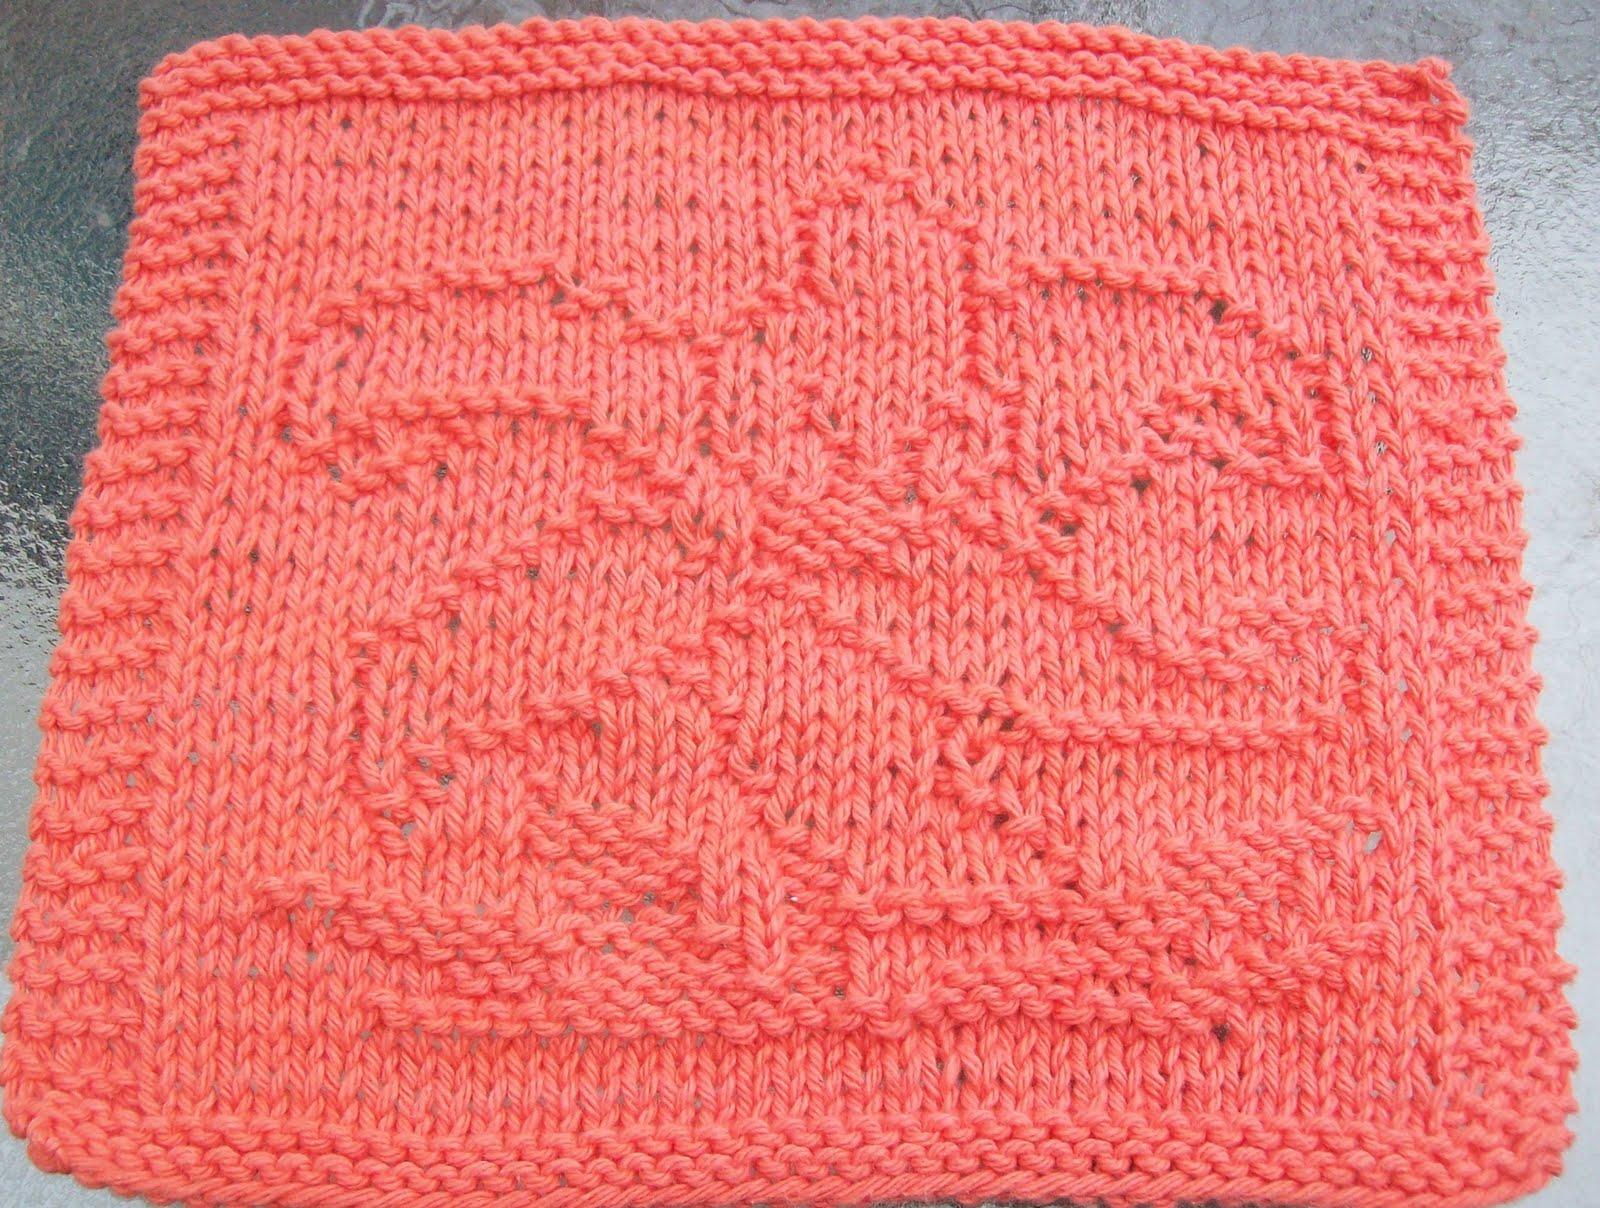 DigKnitty Designs: Lily Knit Dishcloth Pattern